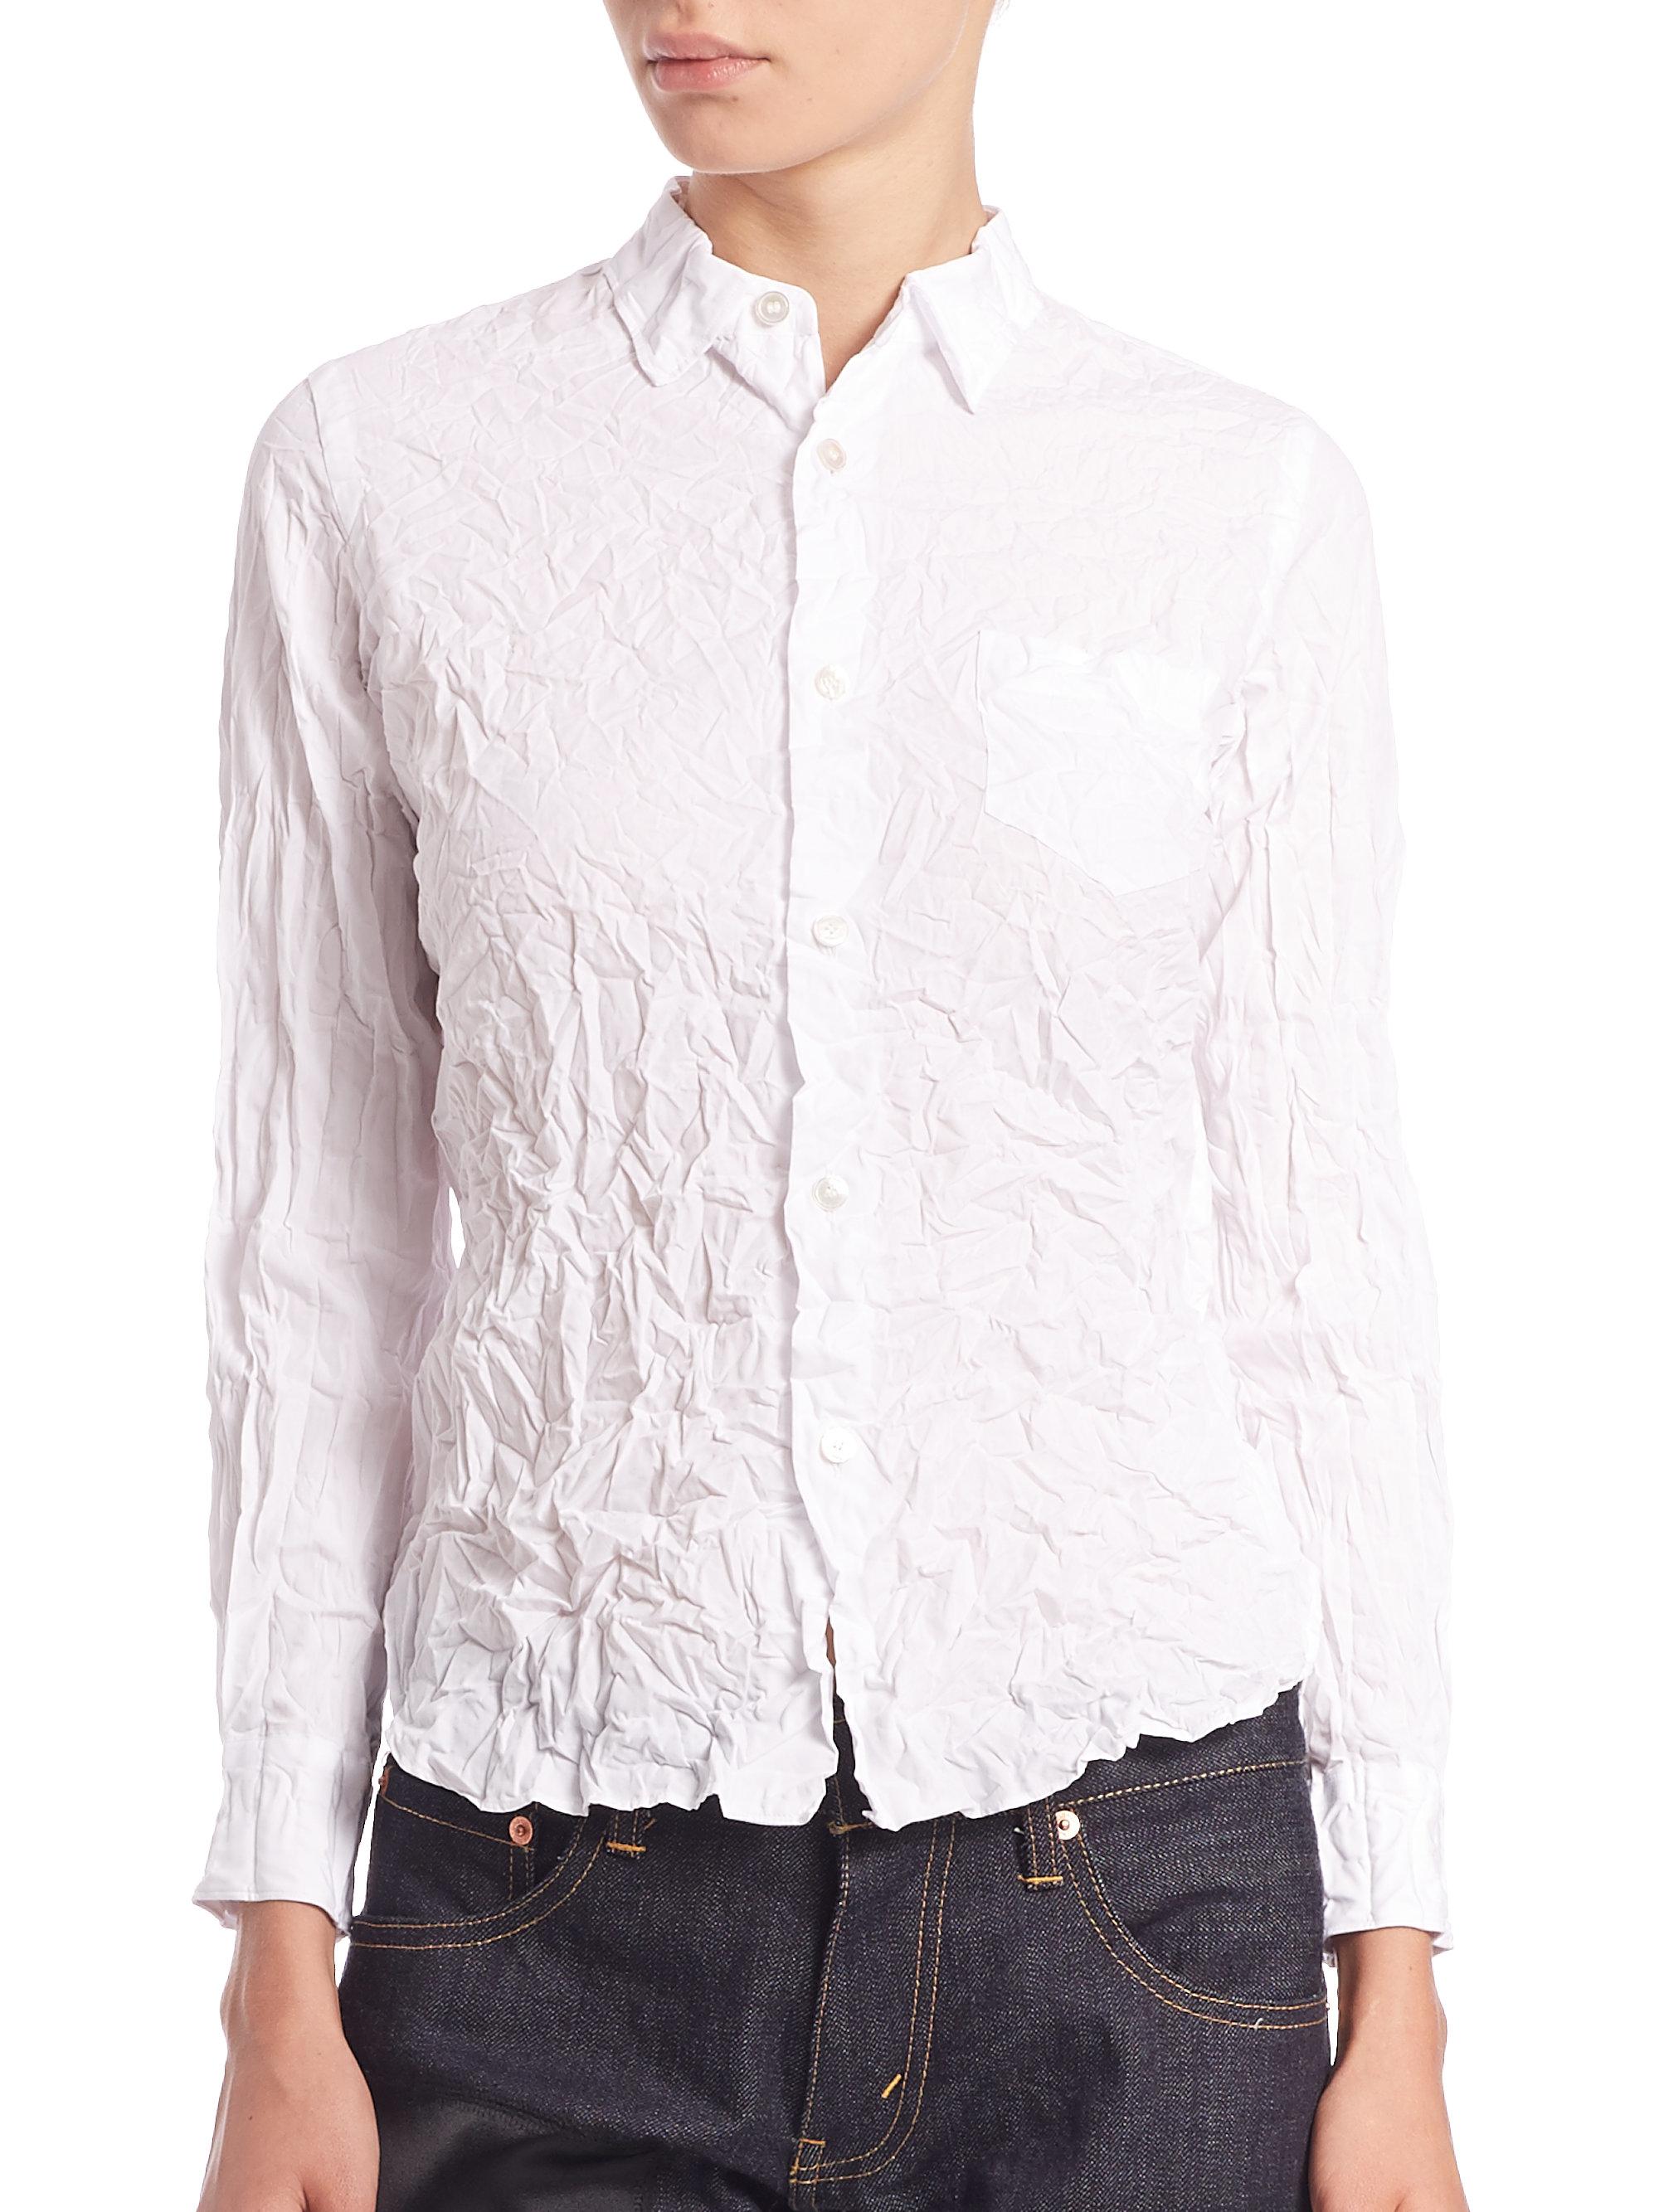 Junya watanabe Wrinkled Poplin Shirt in White | Lyst